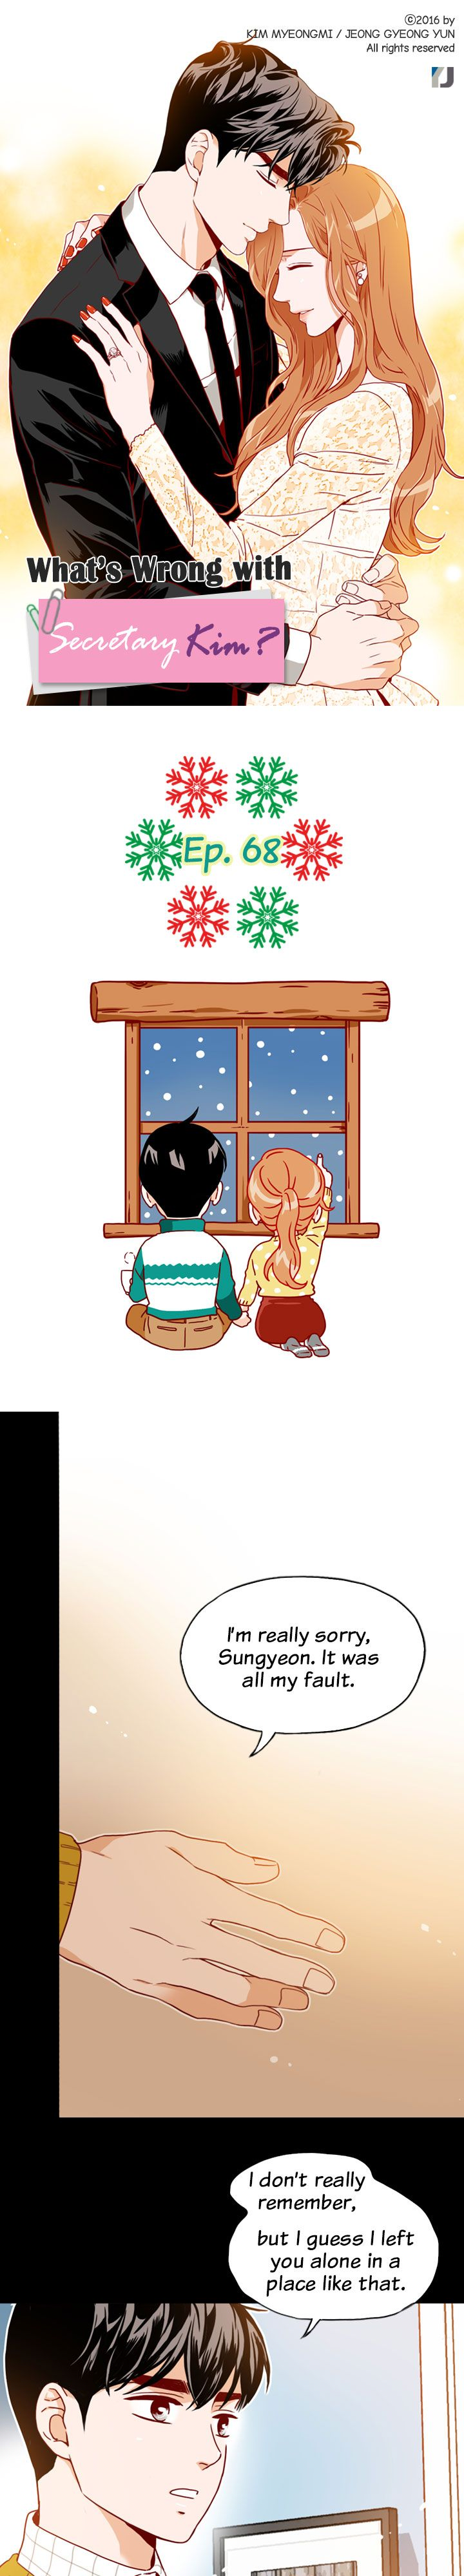 https://manga.mangadogs.com/comics/pic2/15/25807/960725/fb6c4e0b4b90ebfb5a35ca7a9cbf1d16.jpg Page 1